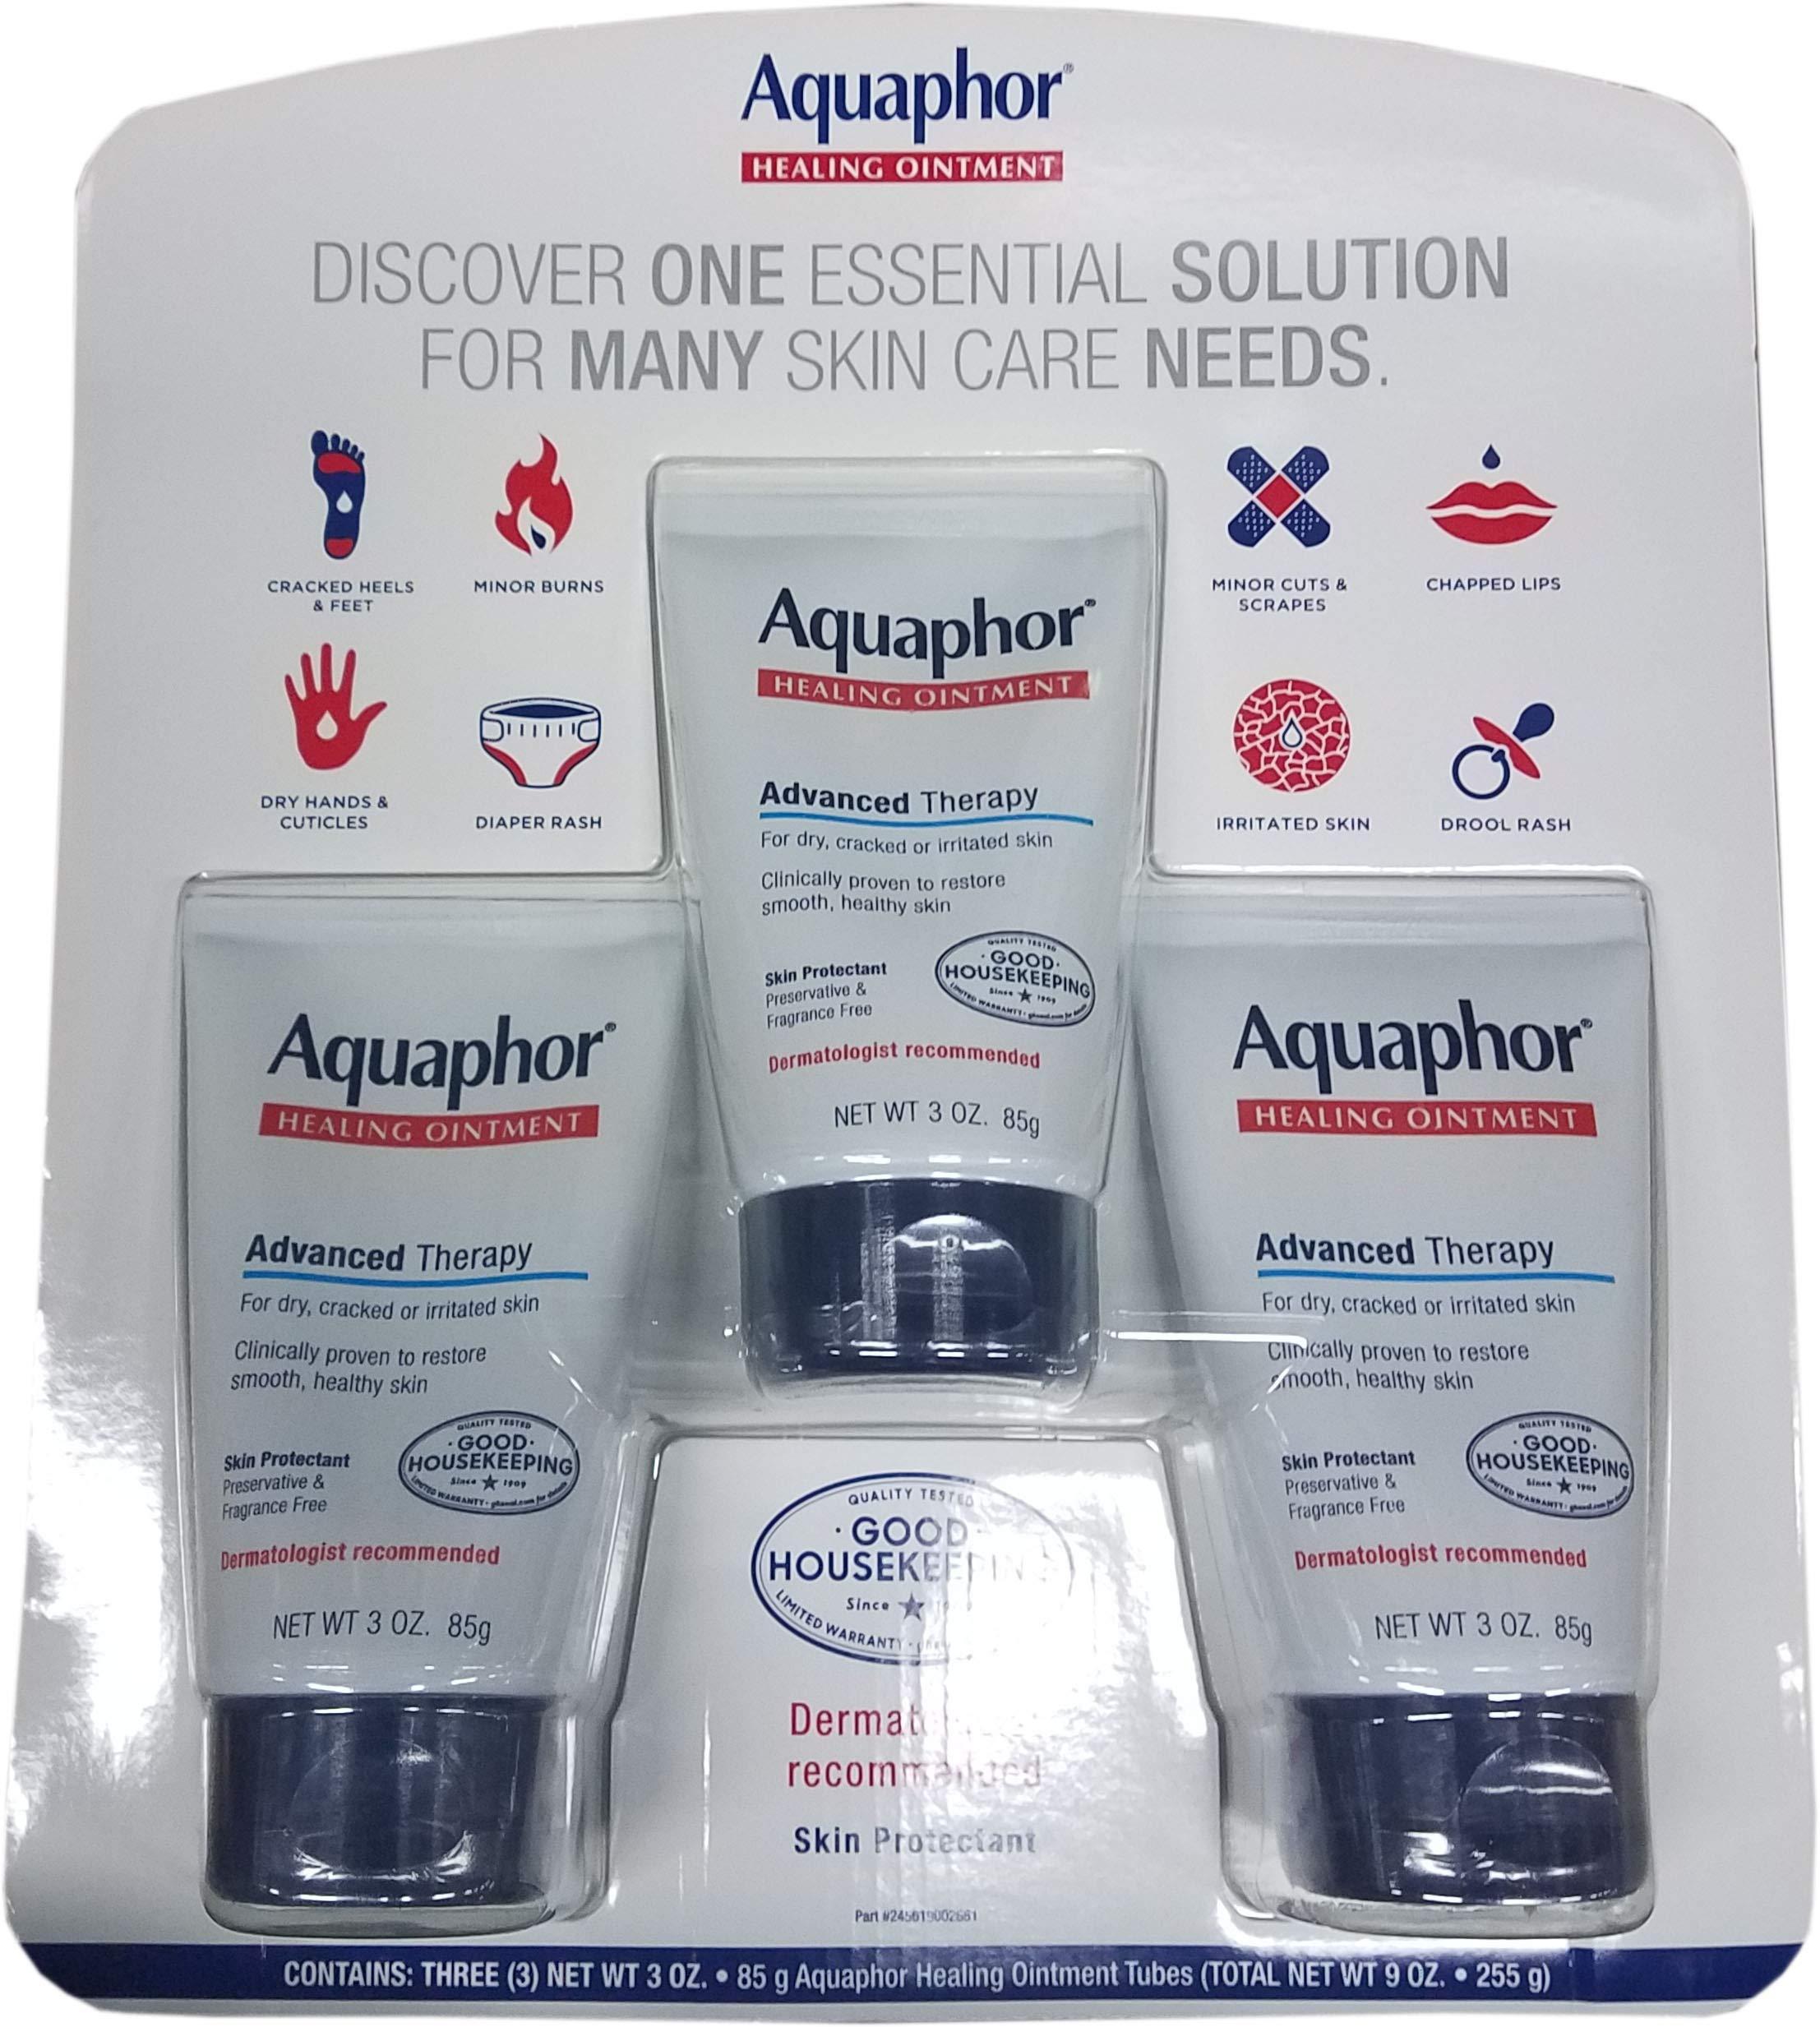 Aquaphor Healing Lotion, 9 Ounce